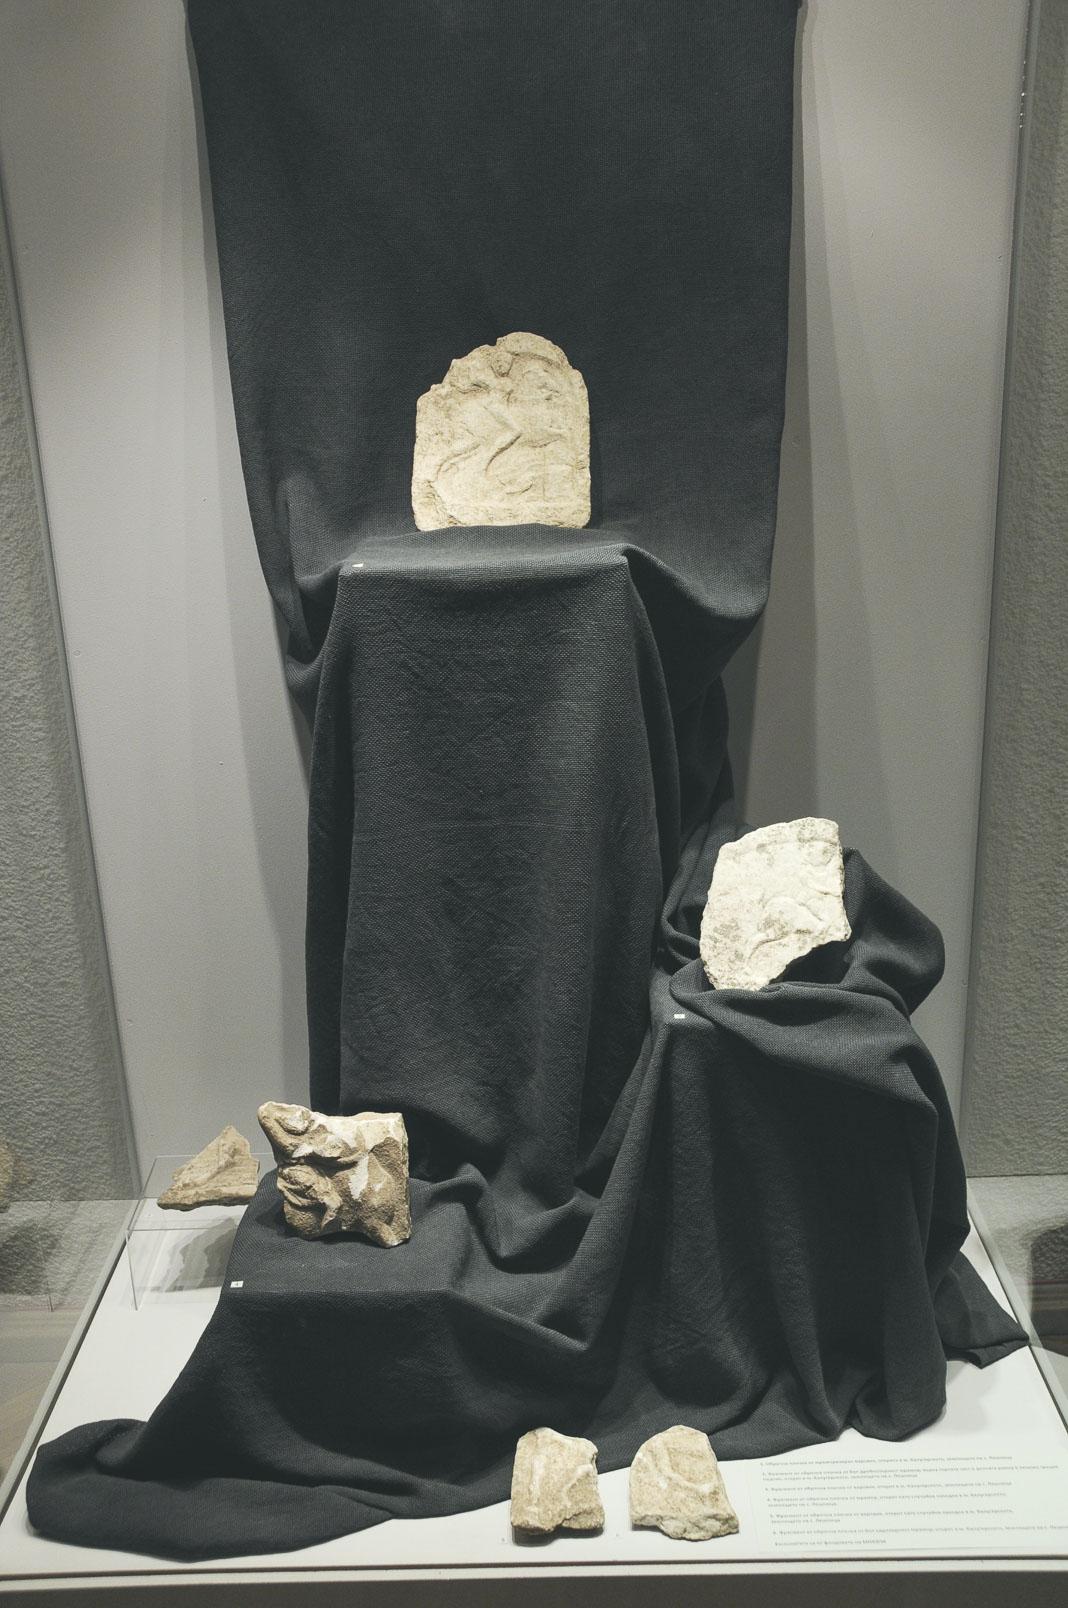 troyan-museum-jivotat-na-edna-idea-1